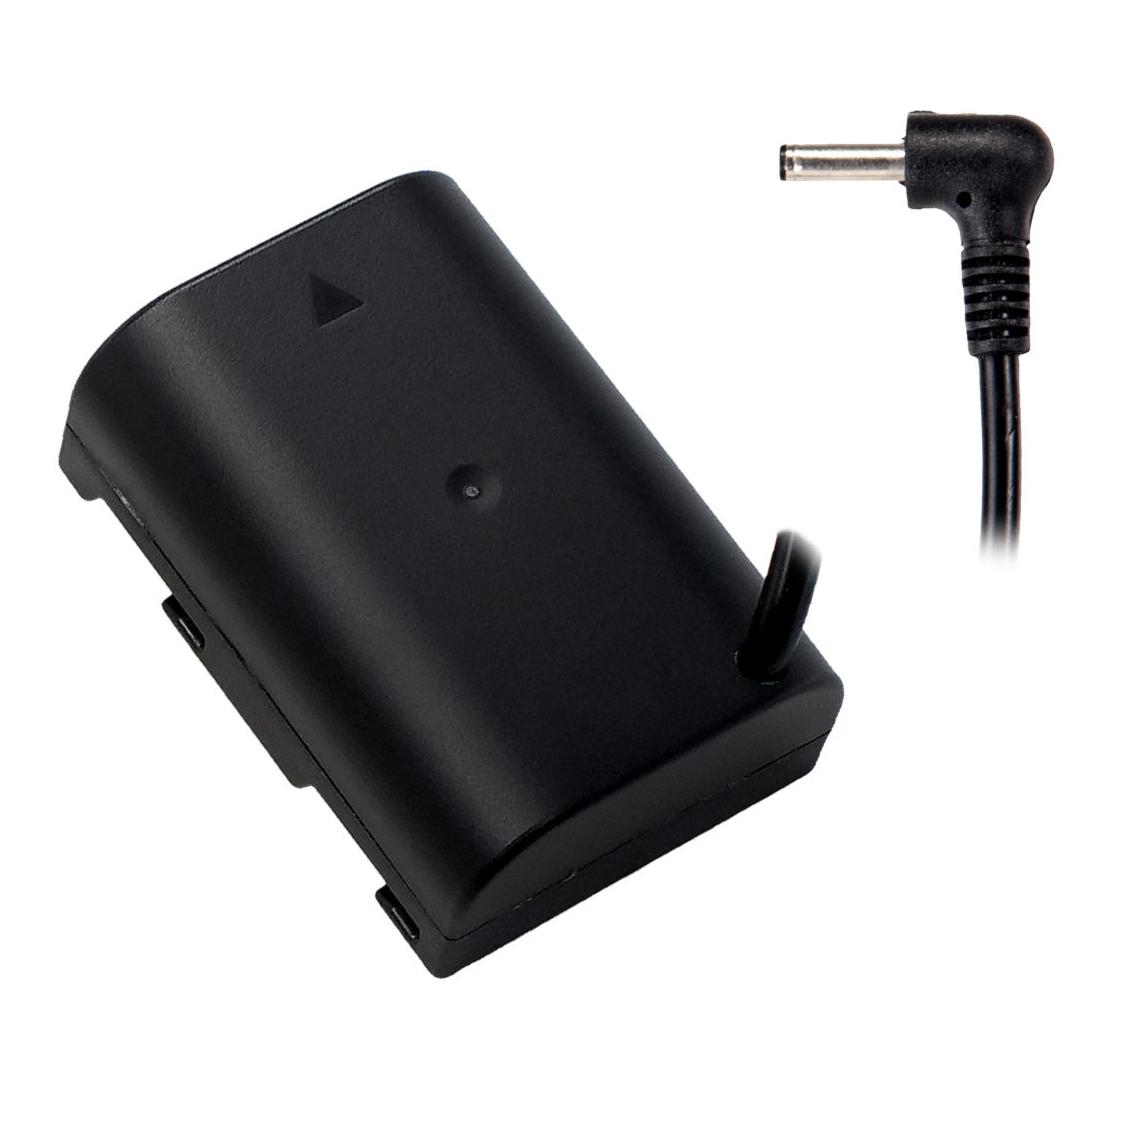 tilta-DB-GH-DCM13-dummy-battery-DMW-BLF19-dc-35-135-adapter-zasilaj%C4%85cy-01.jpg